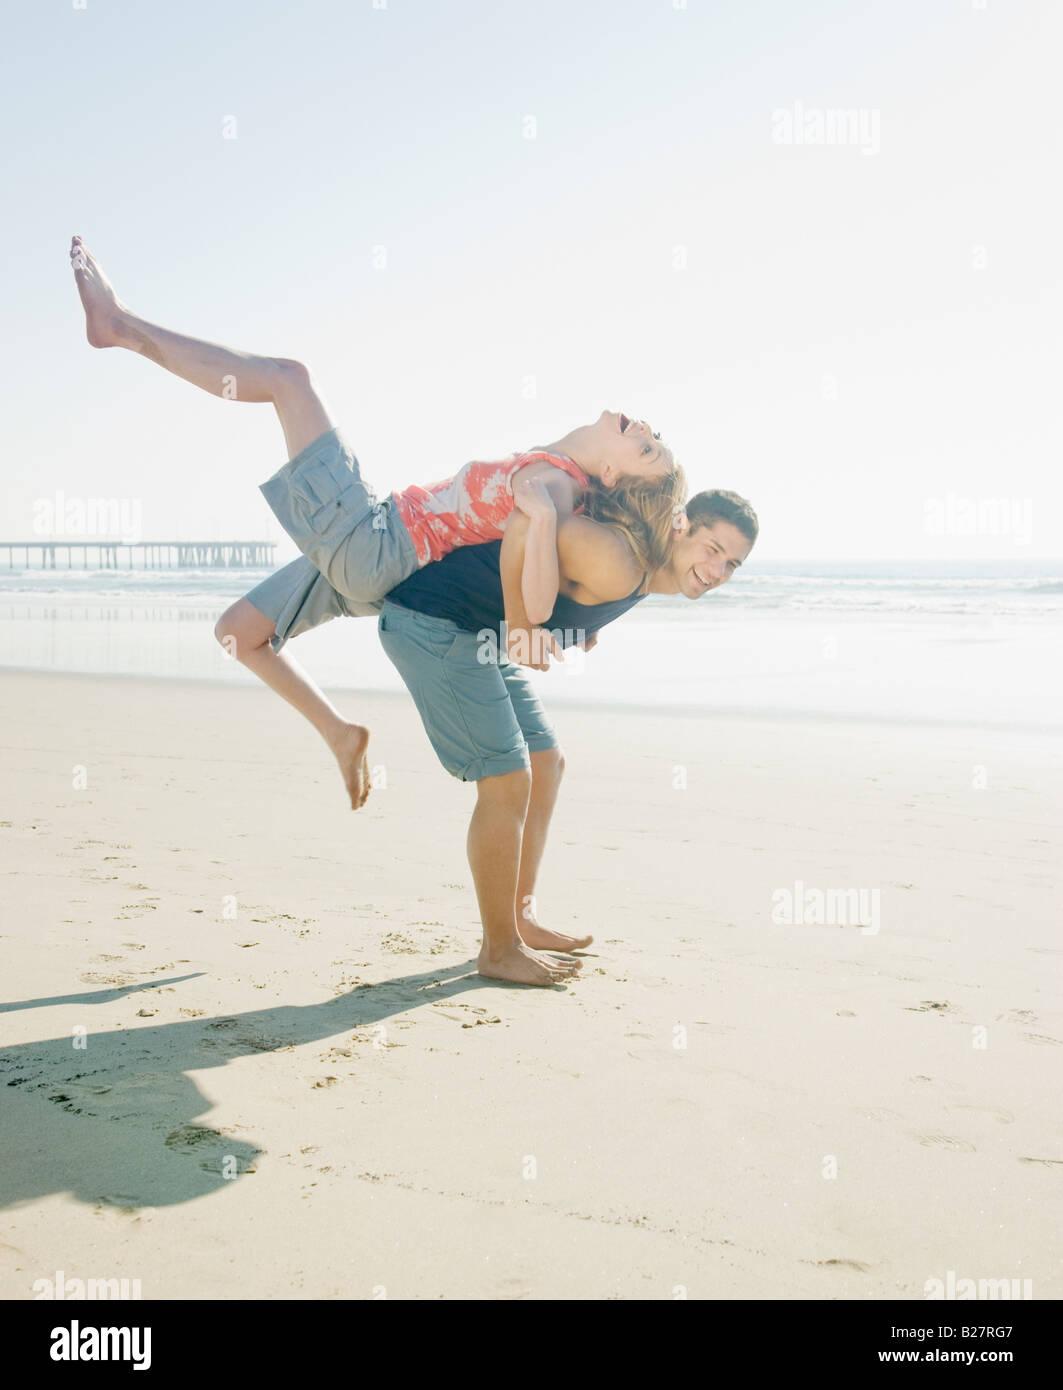 Couple playing around on beach - Stock Image